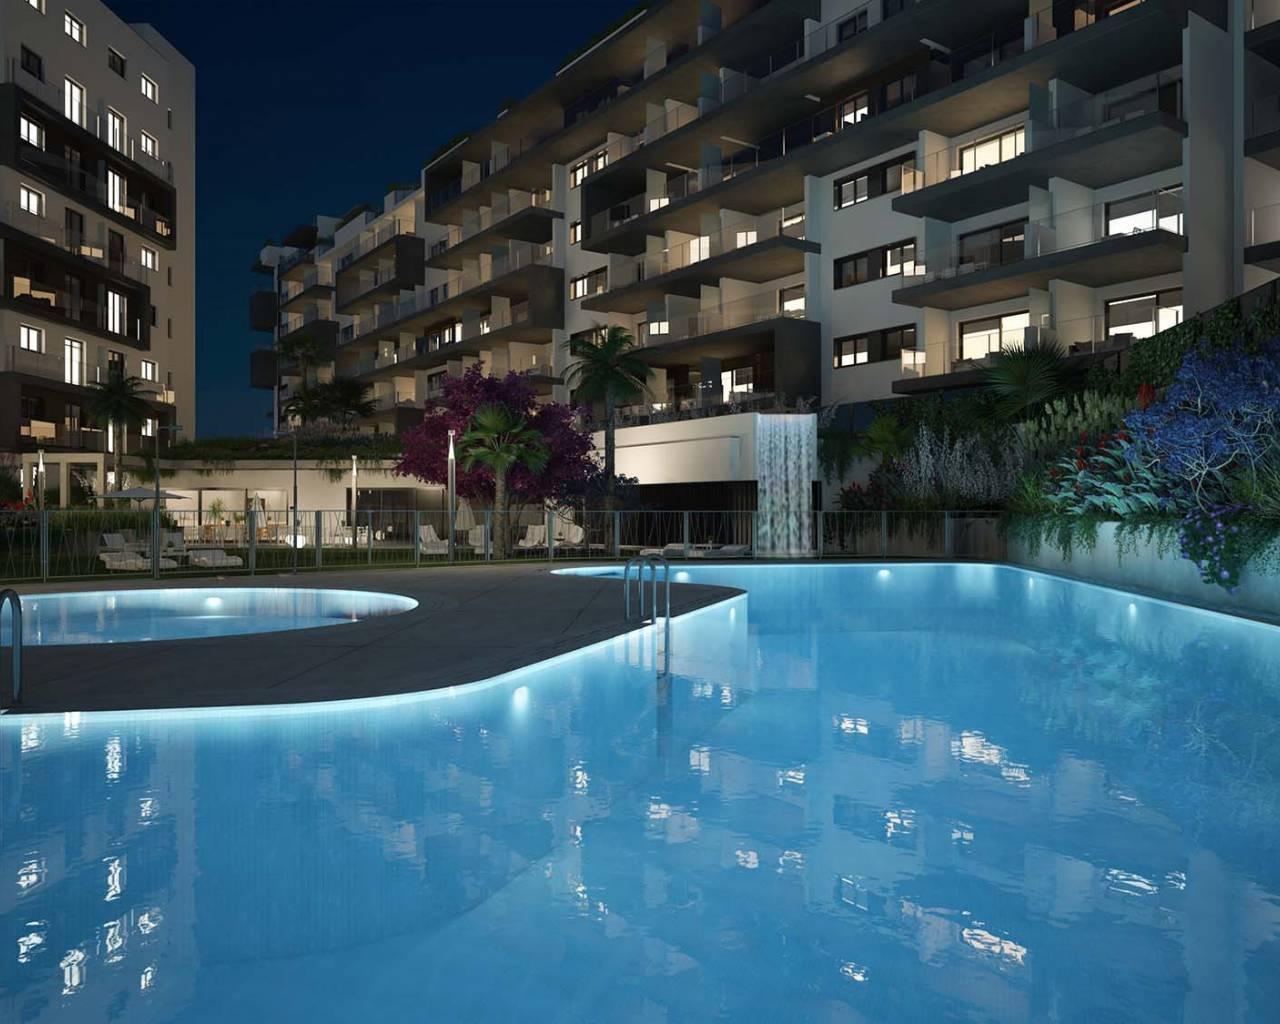 nieuwbouw-appartement-orihuela-costa-campoamor_5587_xl